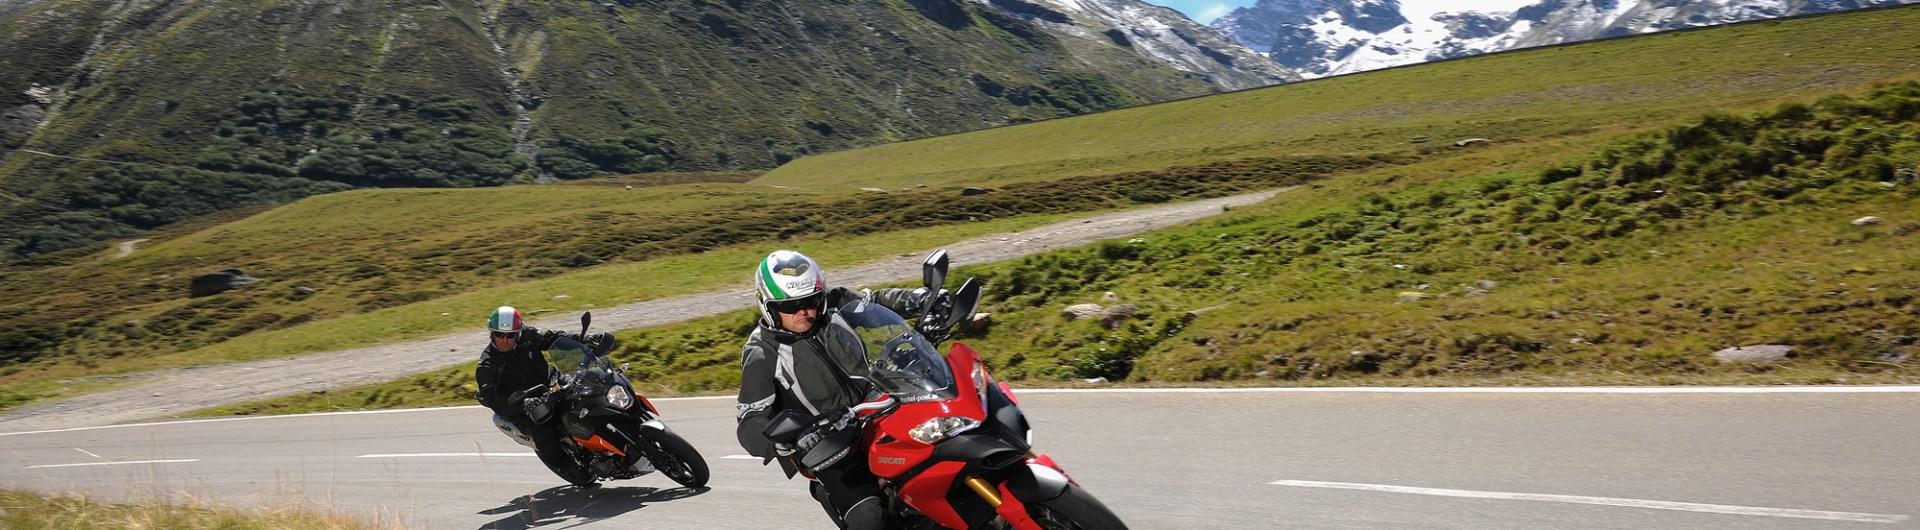 Motorrad fahren in Galtür